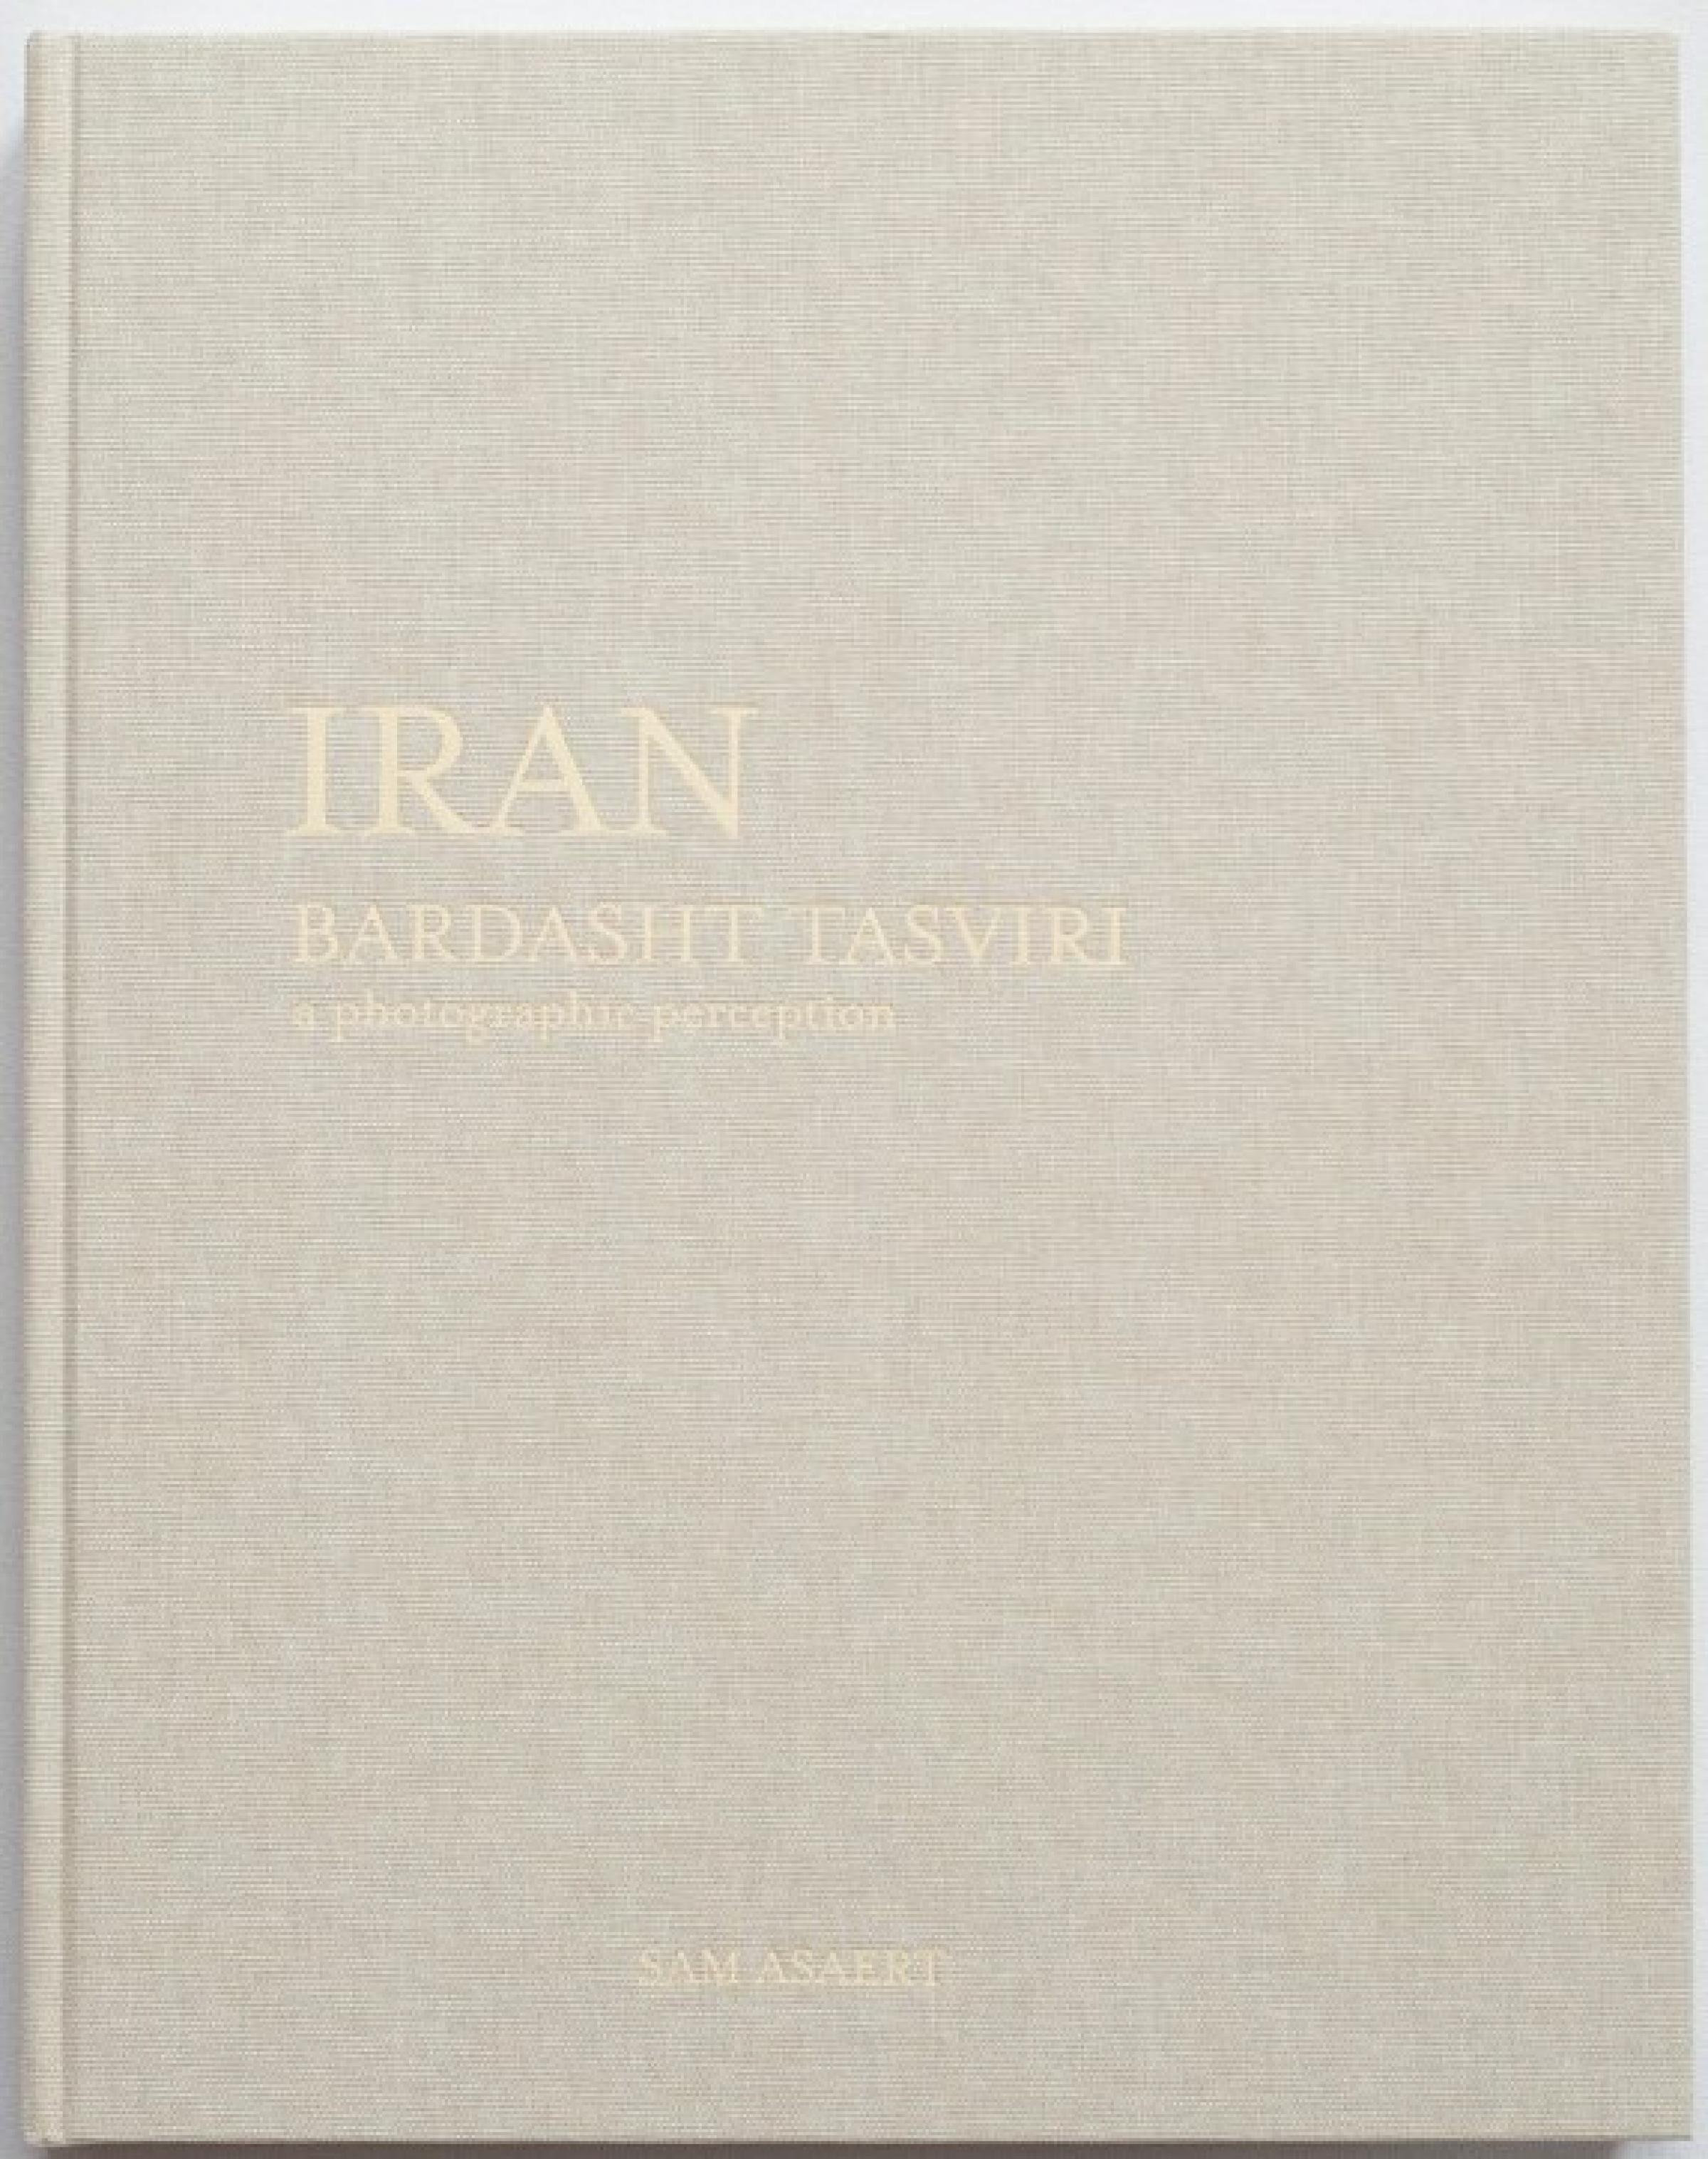 Sam Asaert: Iran